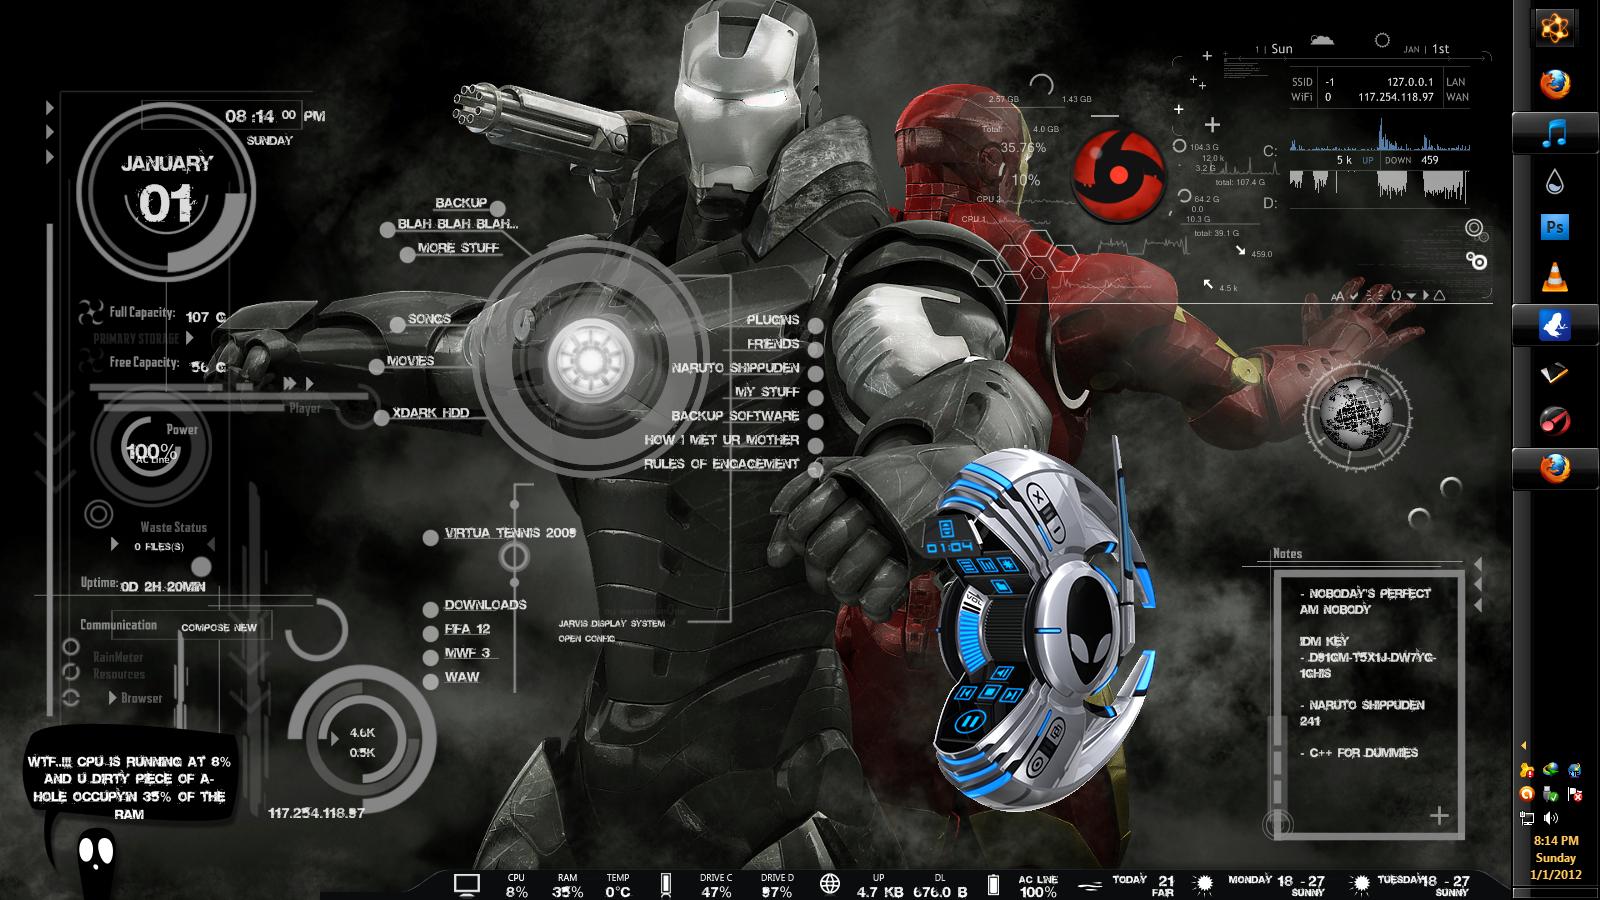 Animated 3d wallpaper jarvis interface - 3d Theme For Windows7 Rar Tatl Hayat Huzurevi Ve Bak Mevi